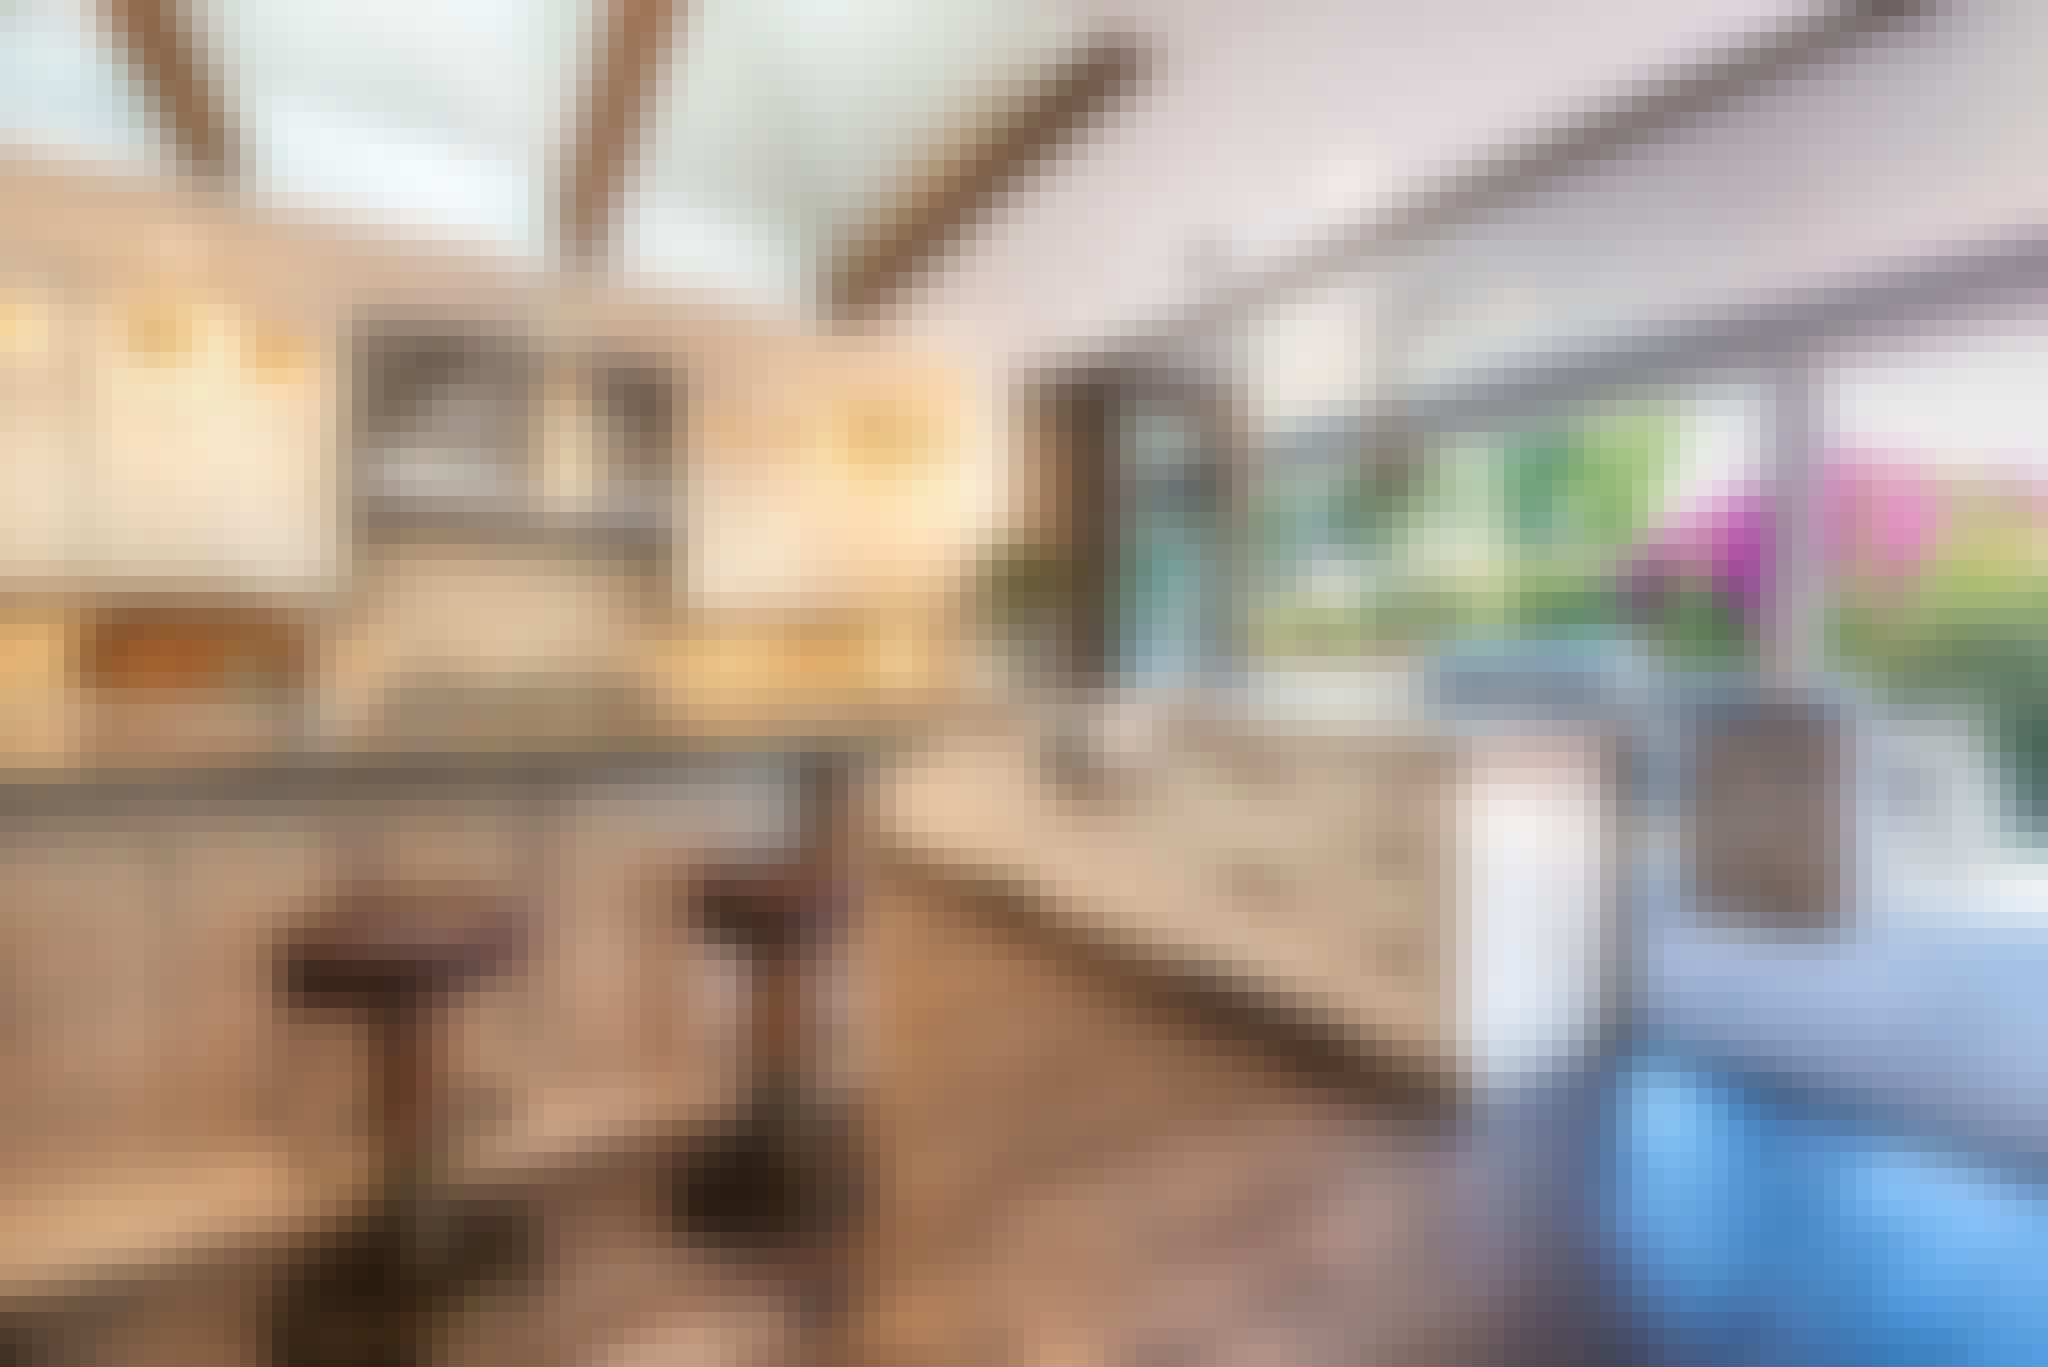 window door combination kitchen transition in residential design